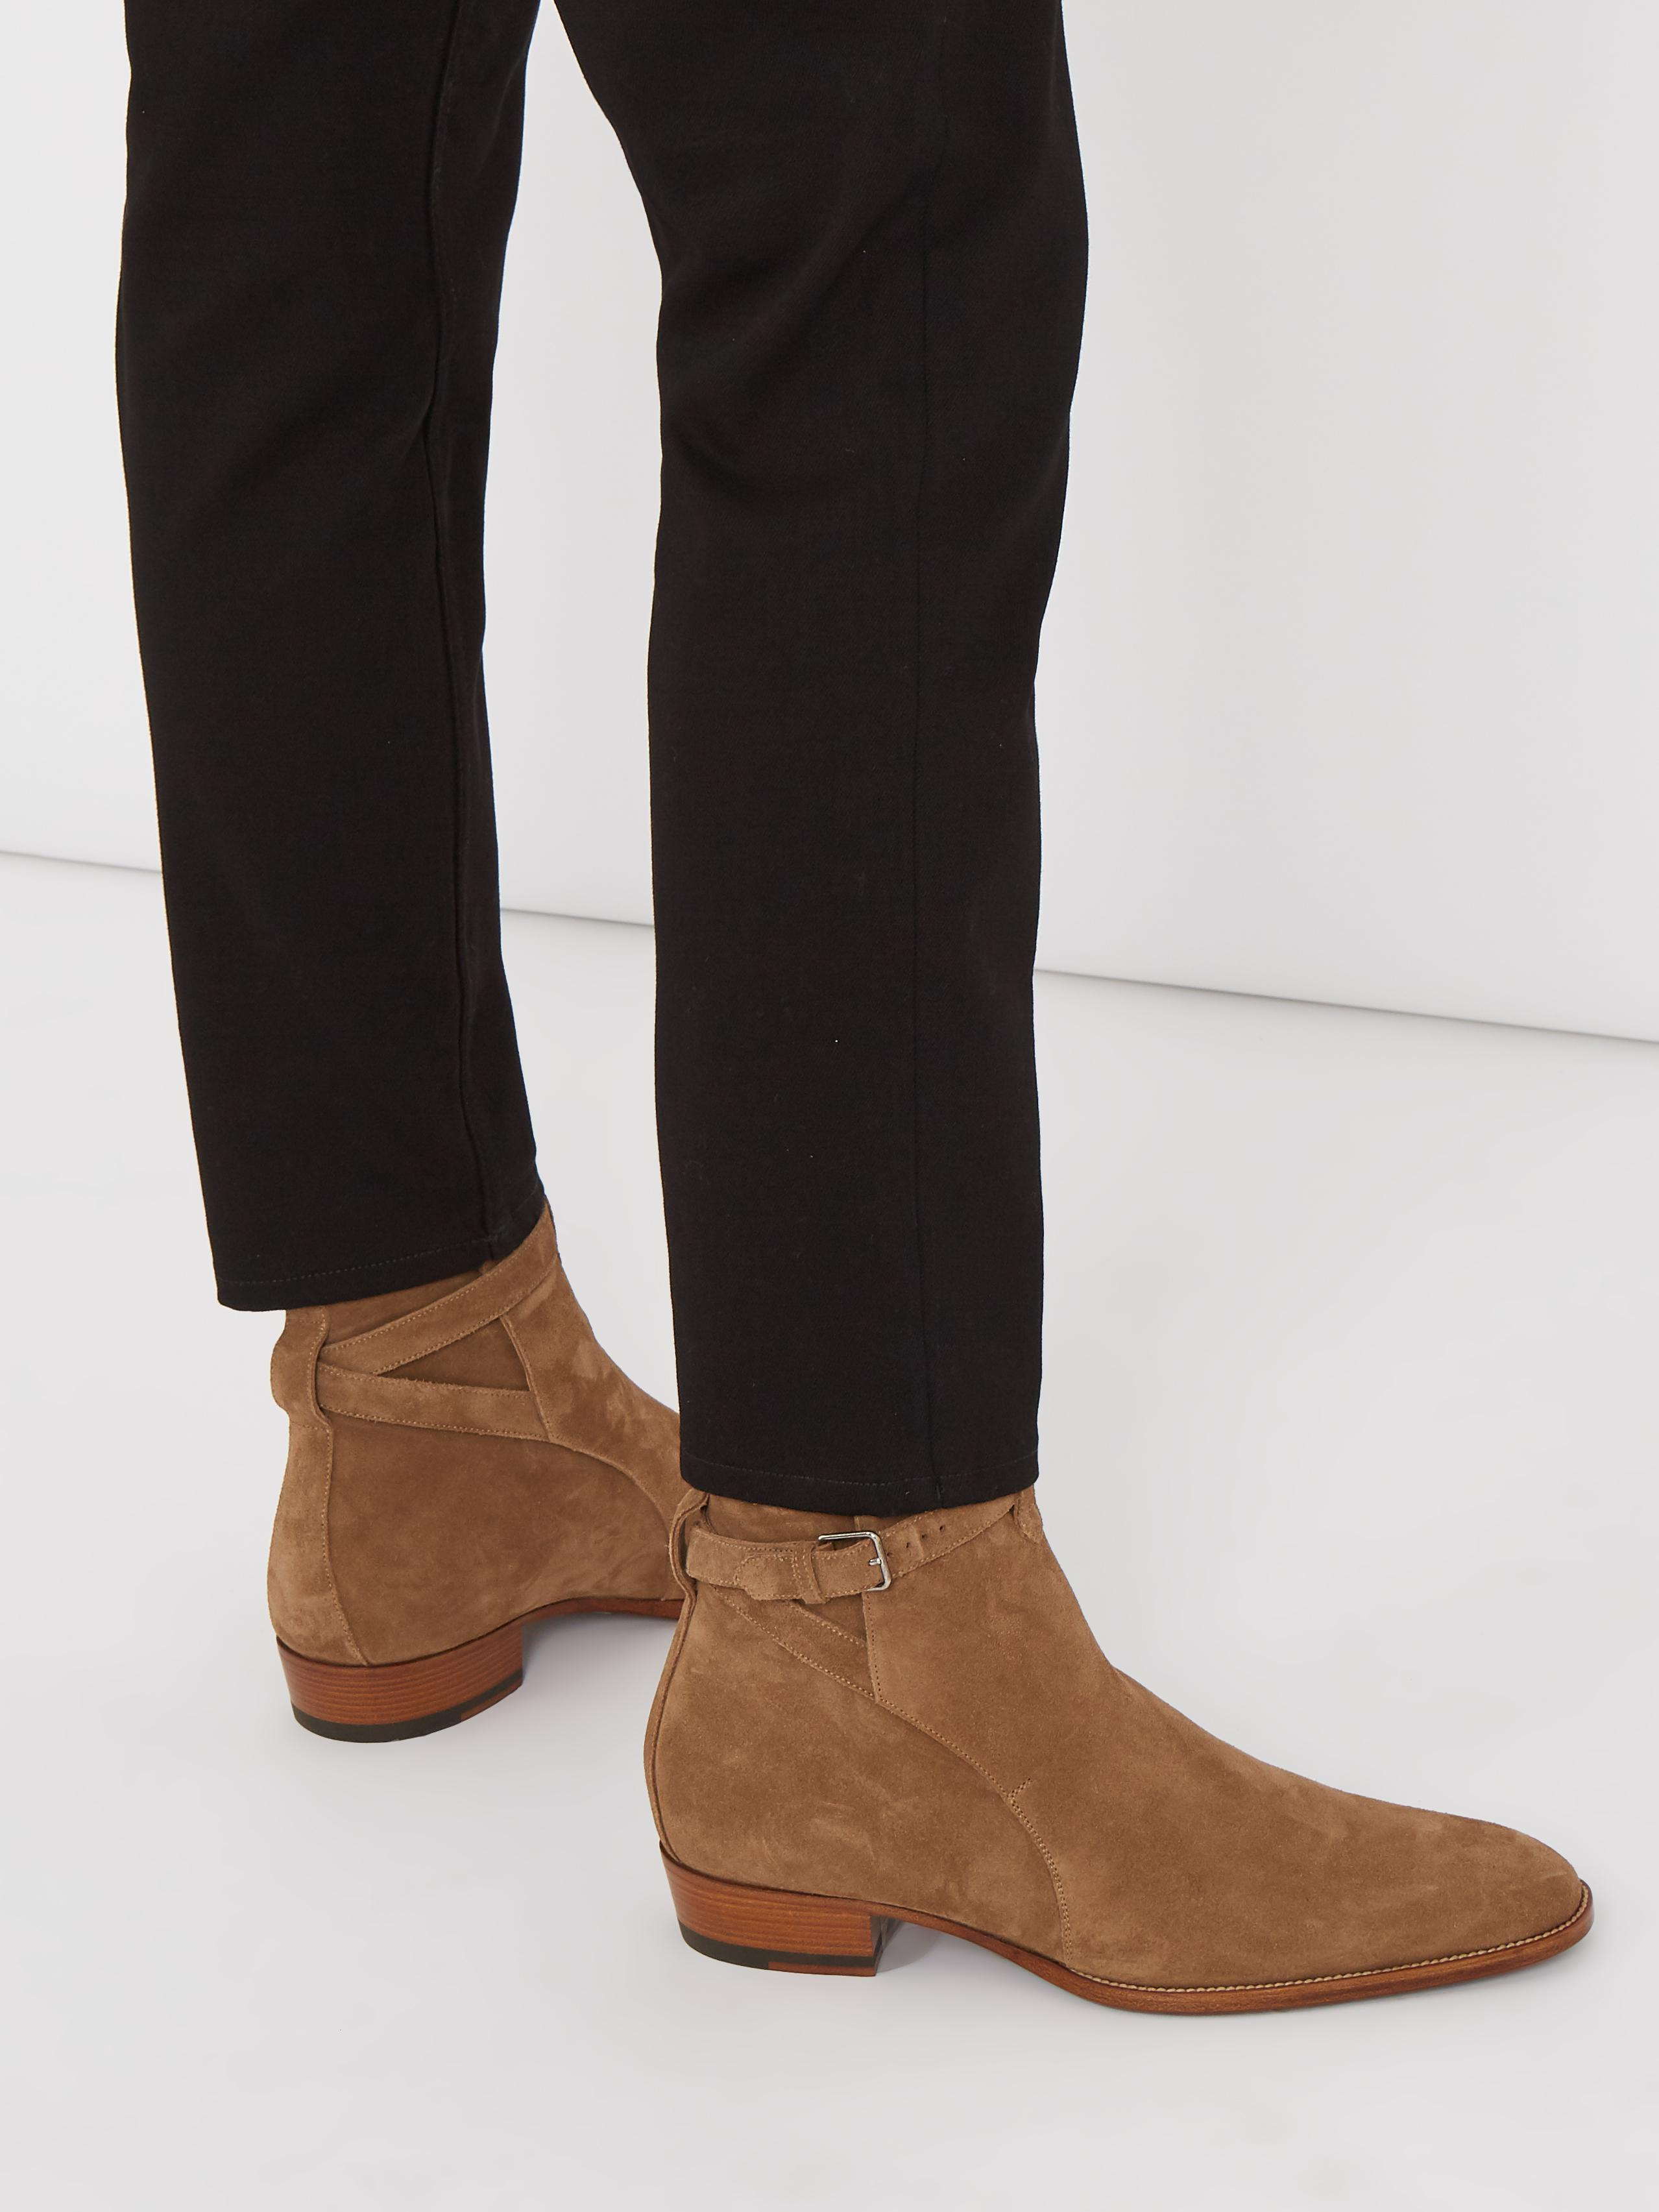 c848cb263d6 Saint Laurent Wyatt Jodhpur Suede Ankle Boots in Brown for Men - Lyst